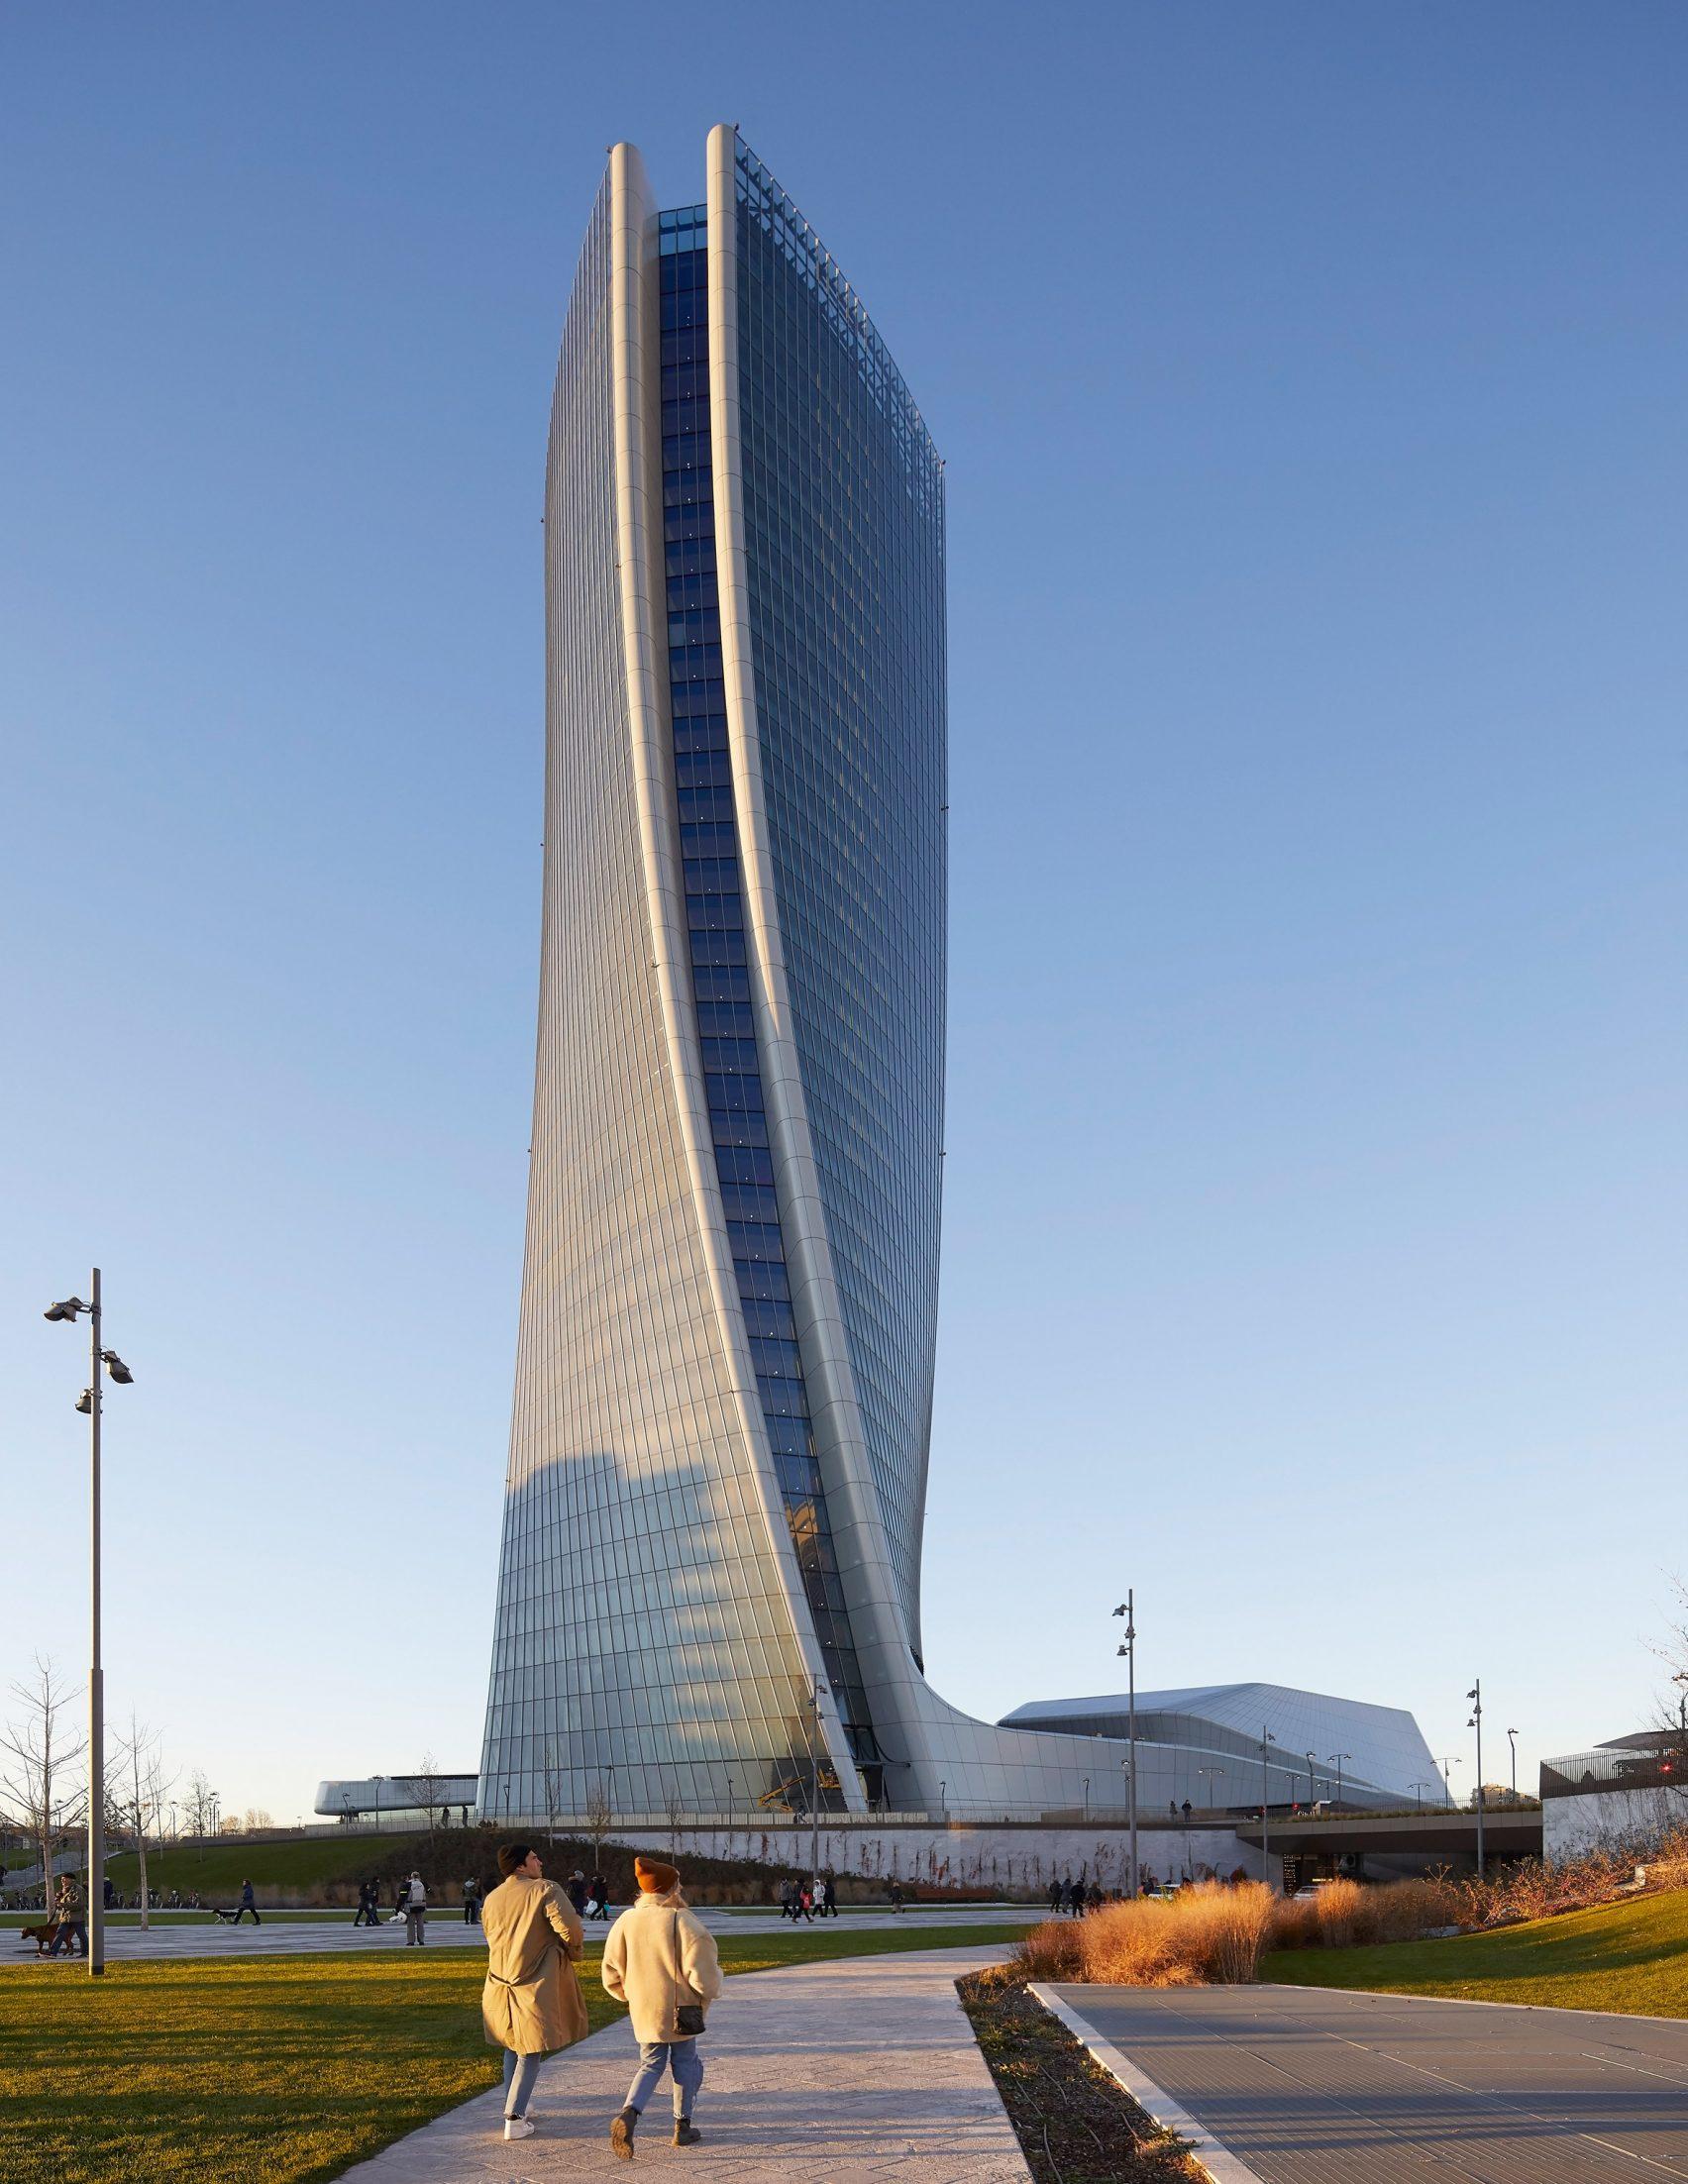 Turning Torso buildings around the world 6